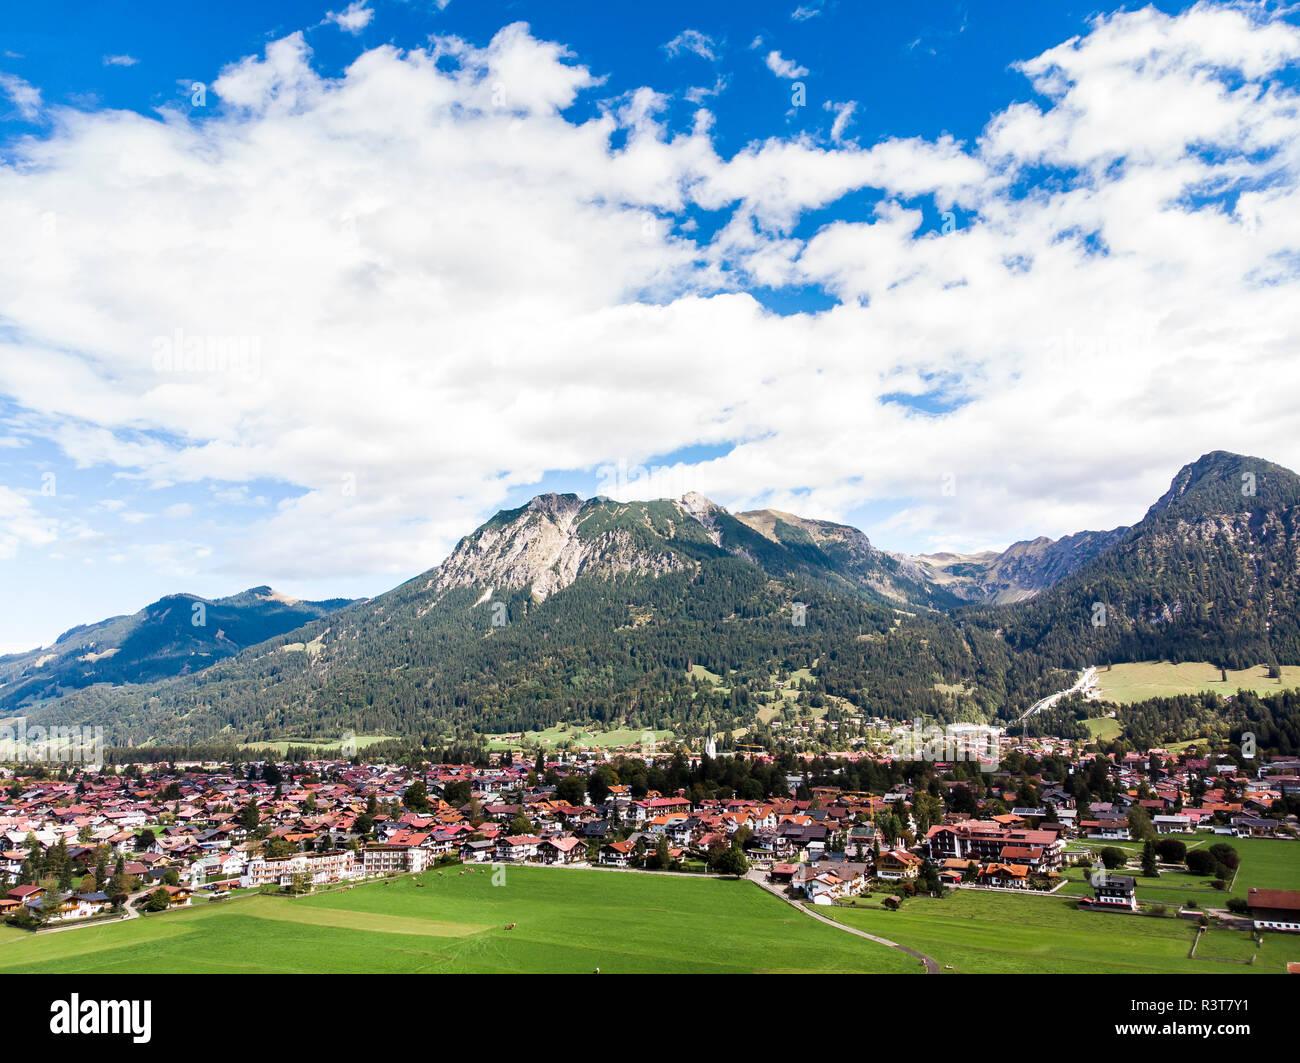 Germany, Bavaria, Swabia, Aerial view of Oberstdorf - Stock Image